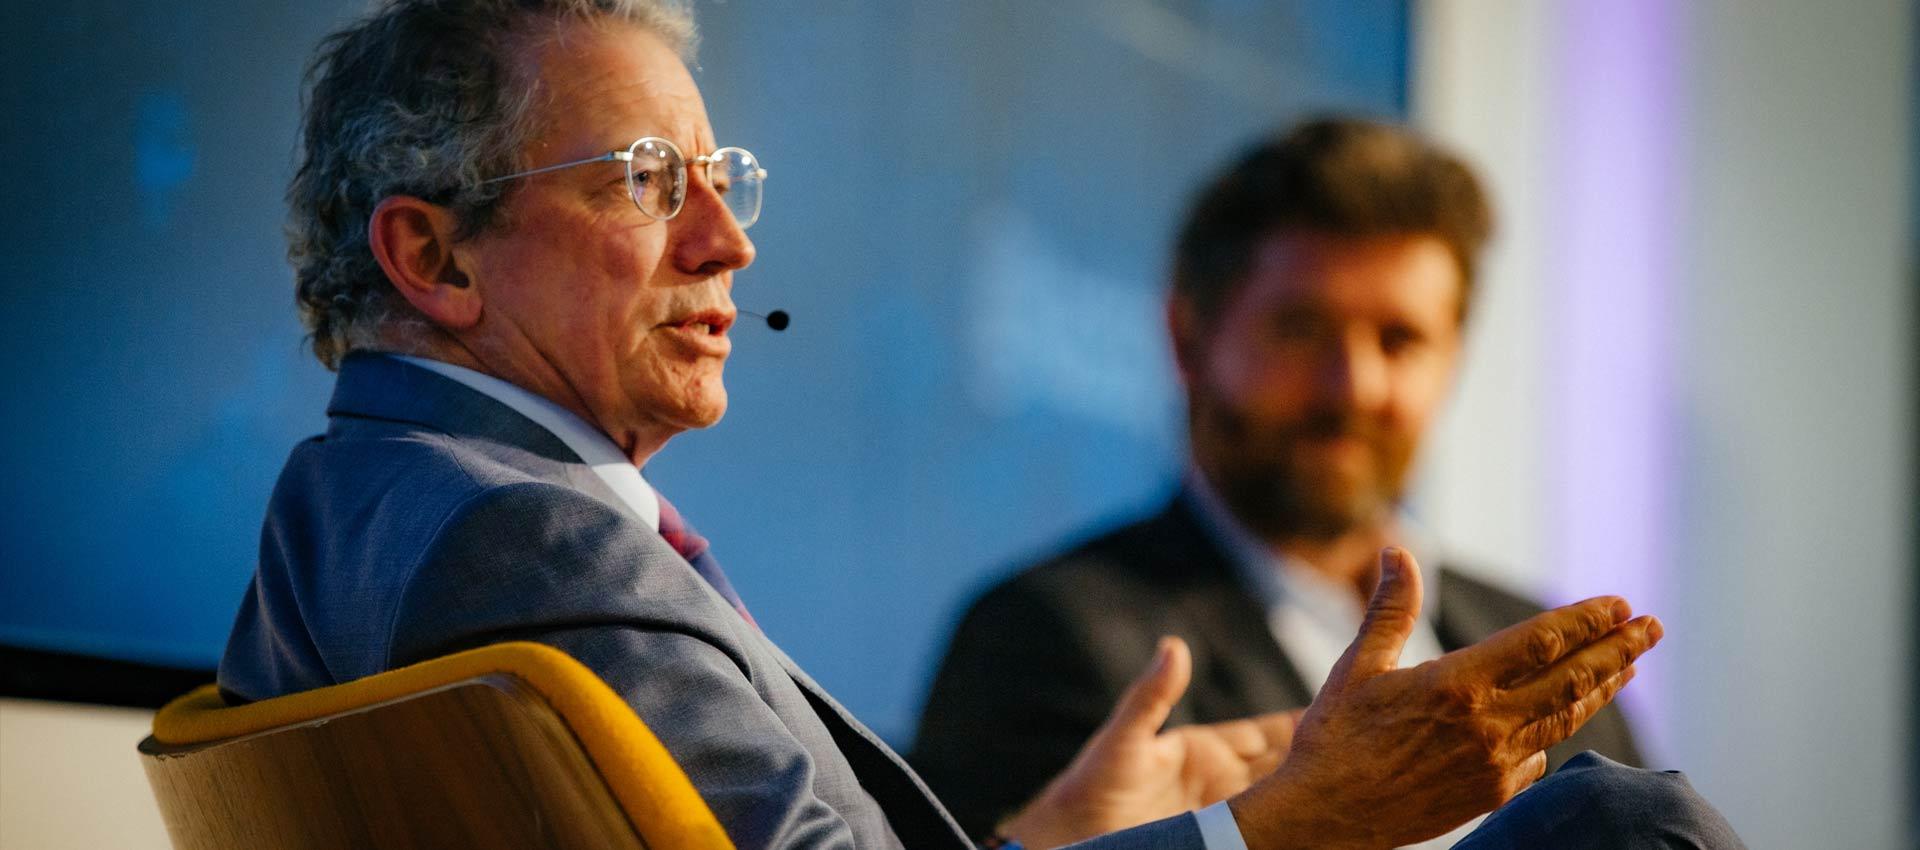 Tom Siebel at Nasdaq Entrepreneurial Center